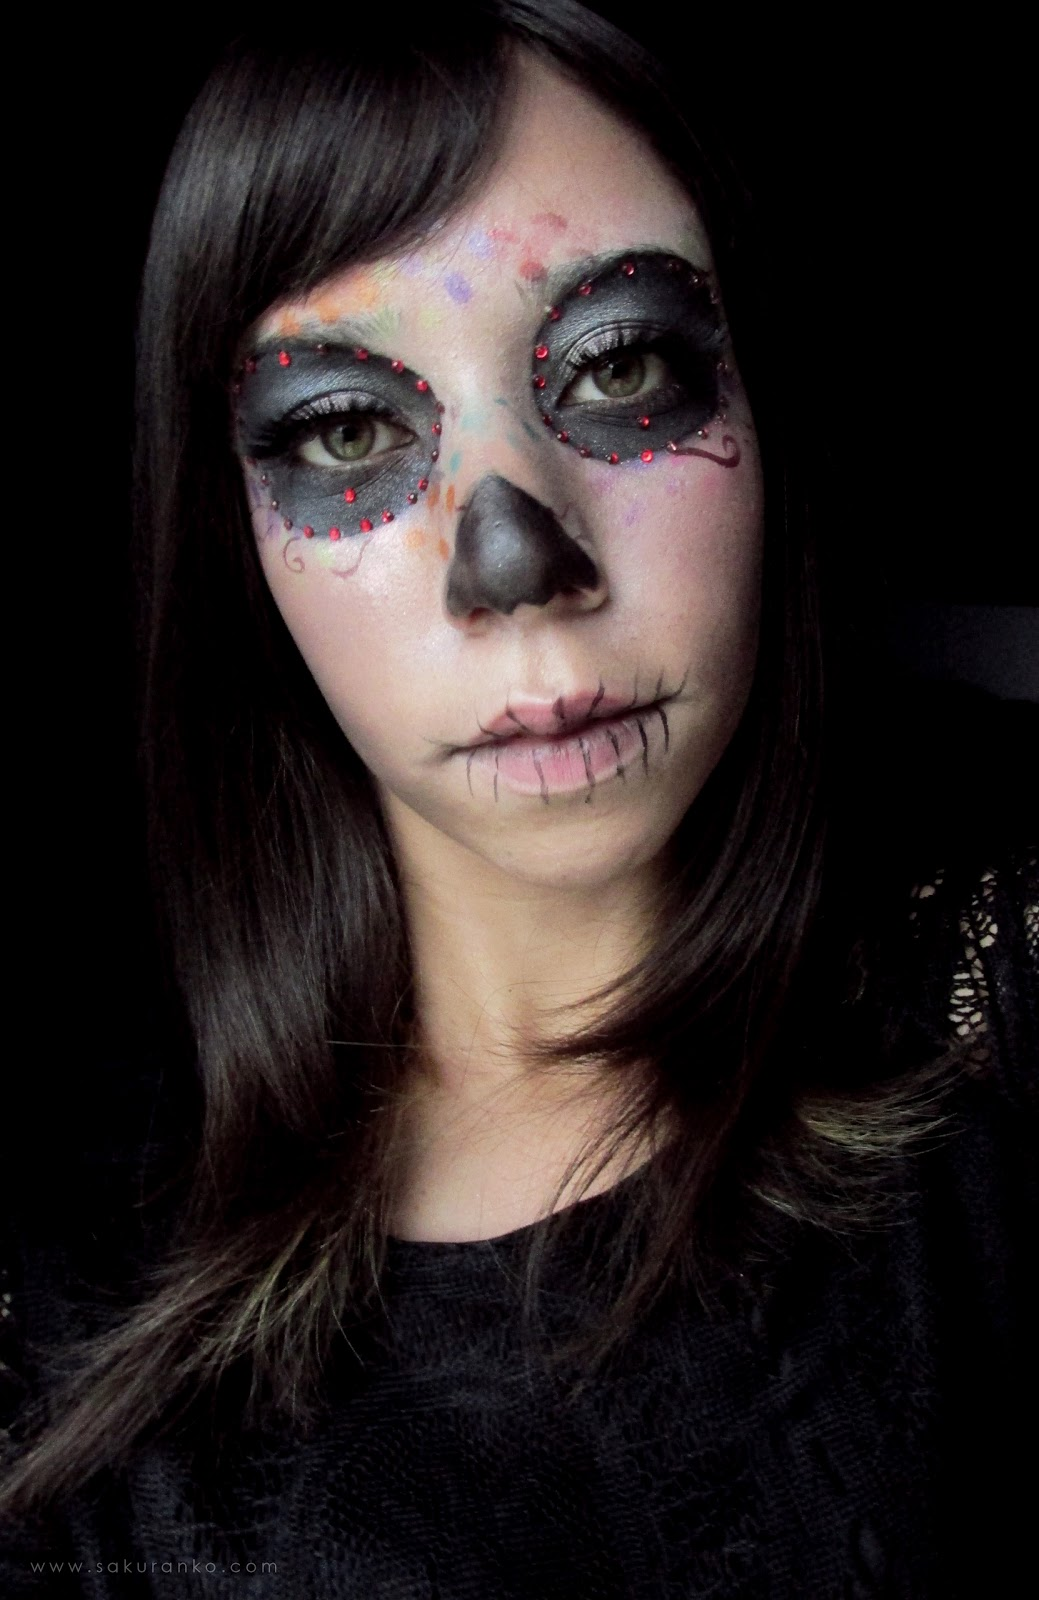 Sakuranko: Skull Color Simple Halloween Makeup